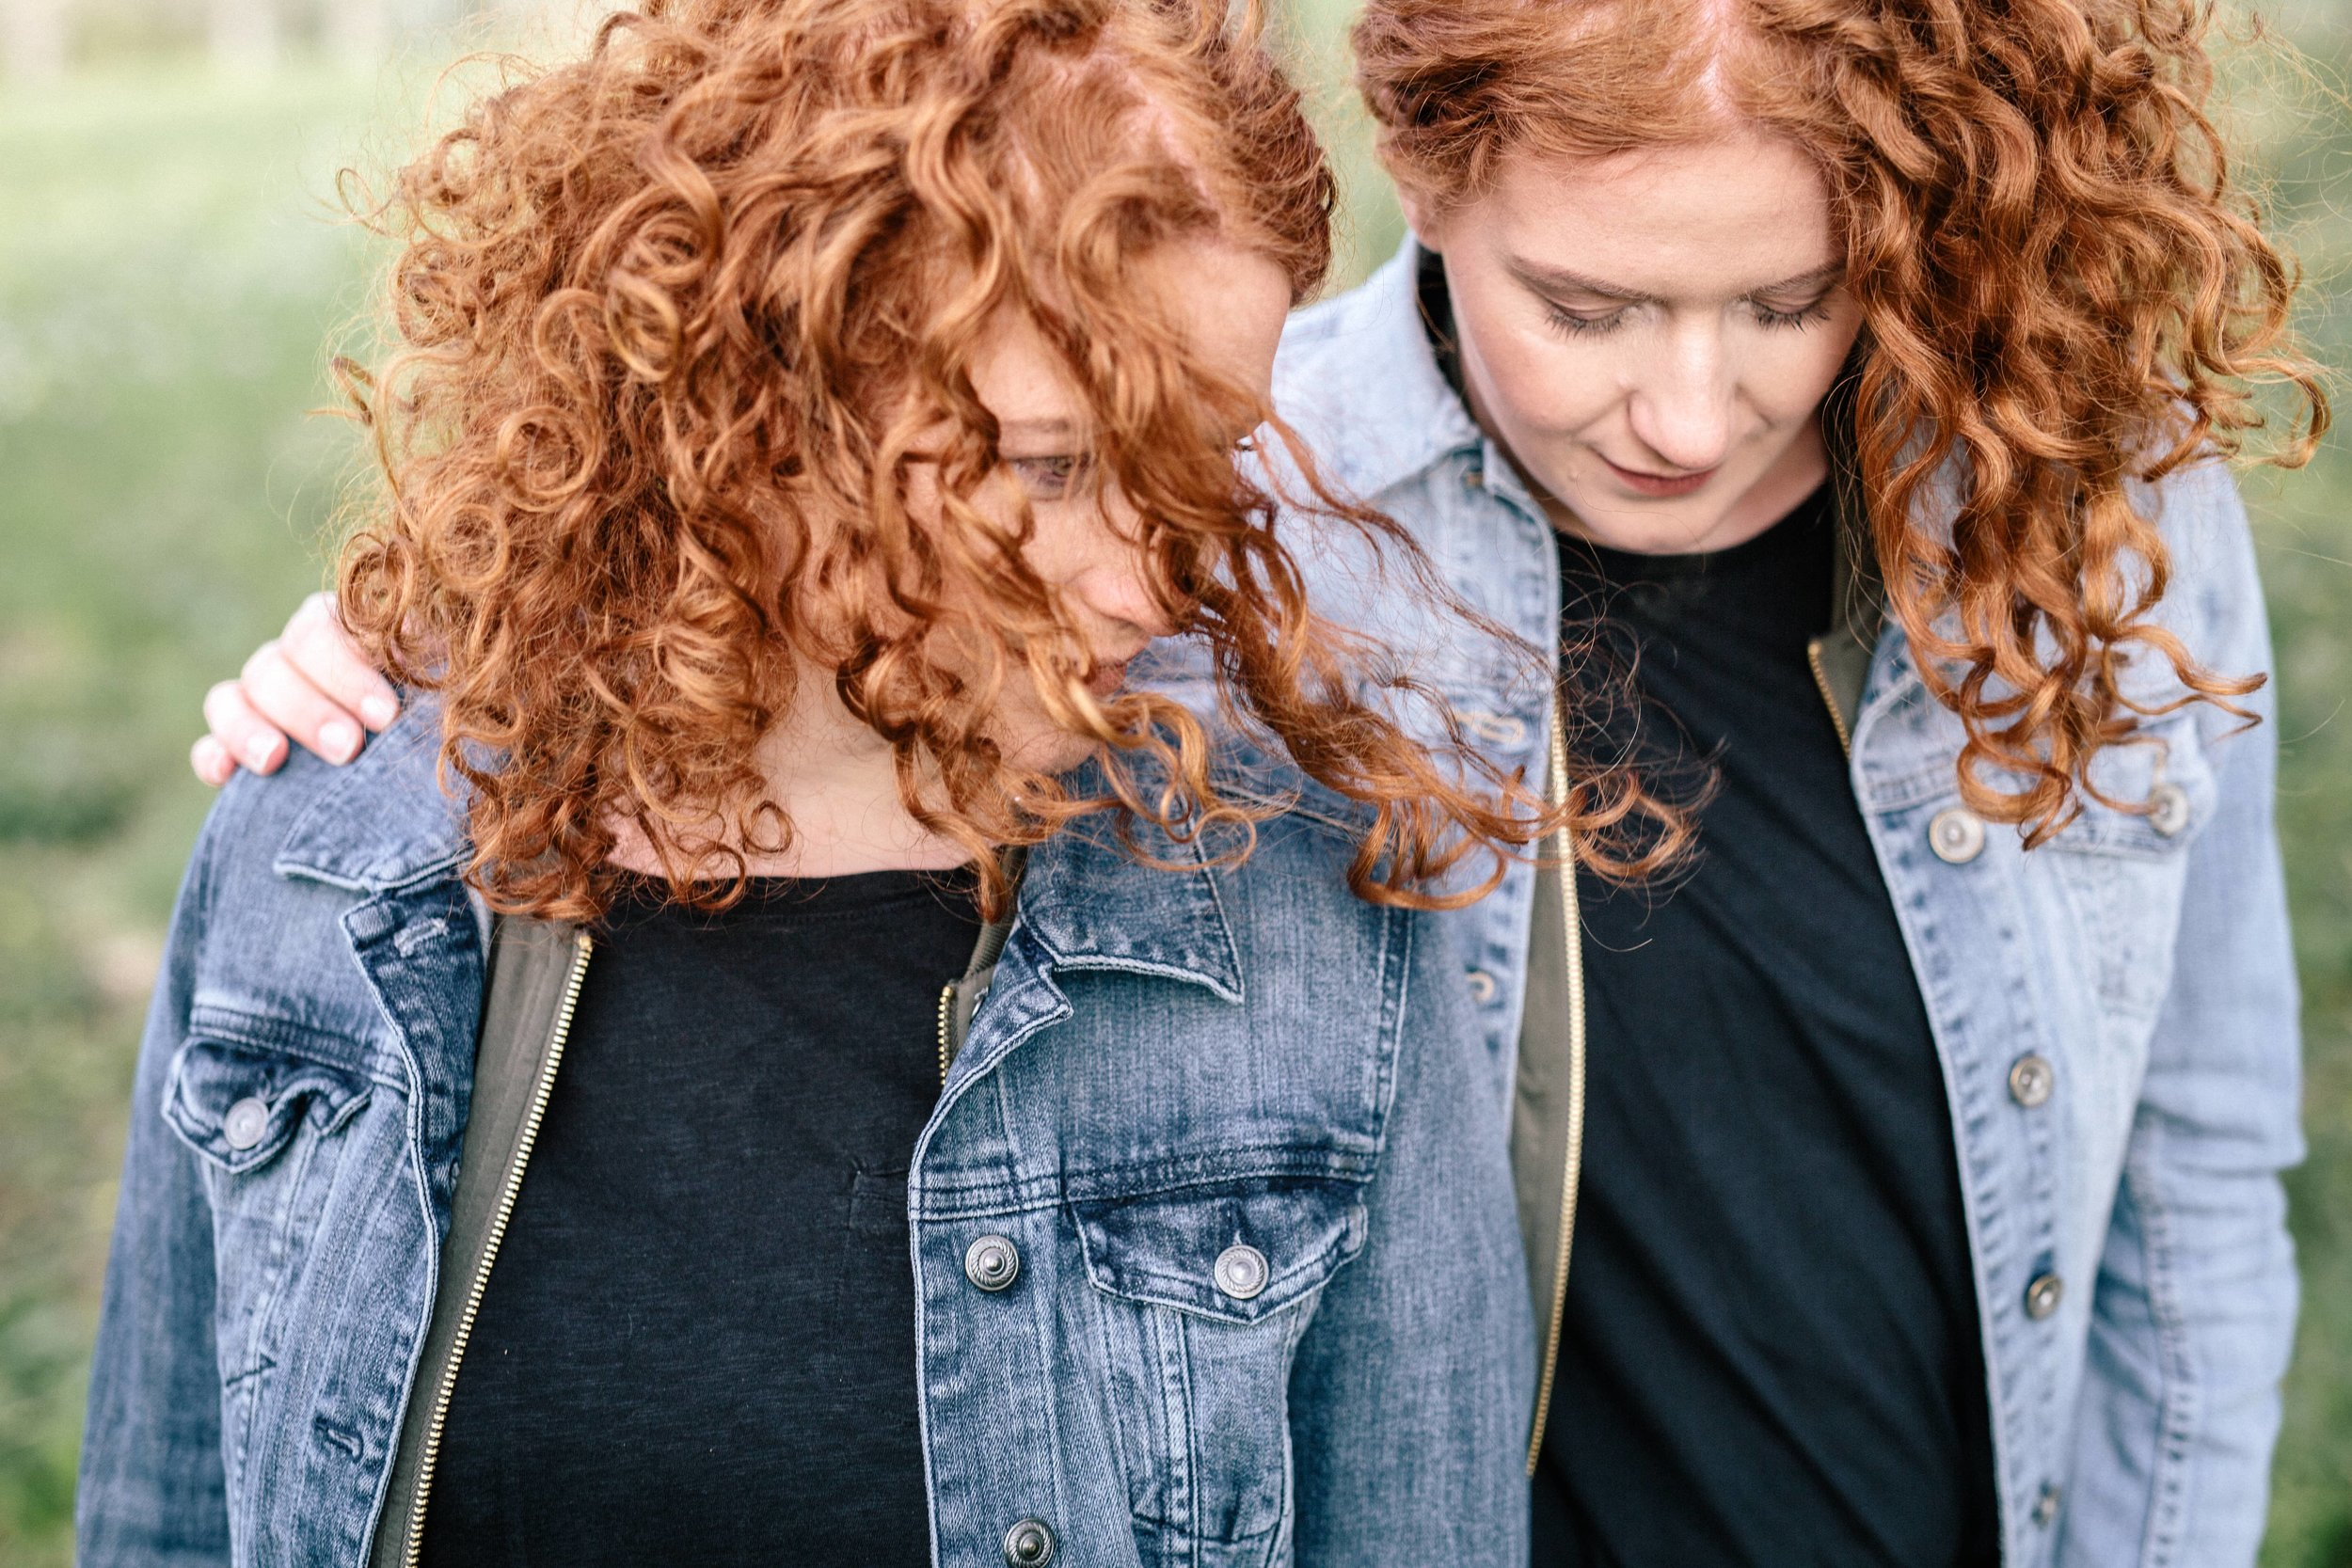 Zwillinge-144.jpg